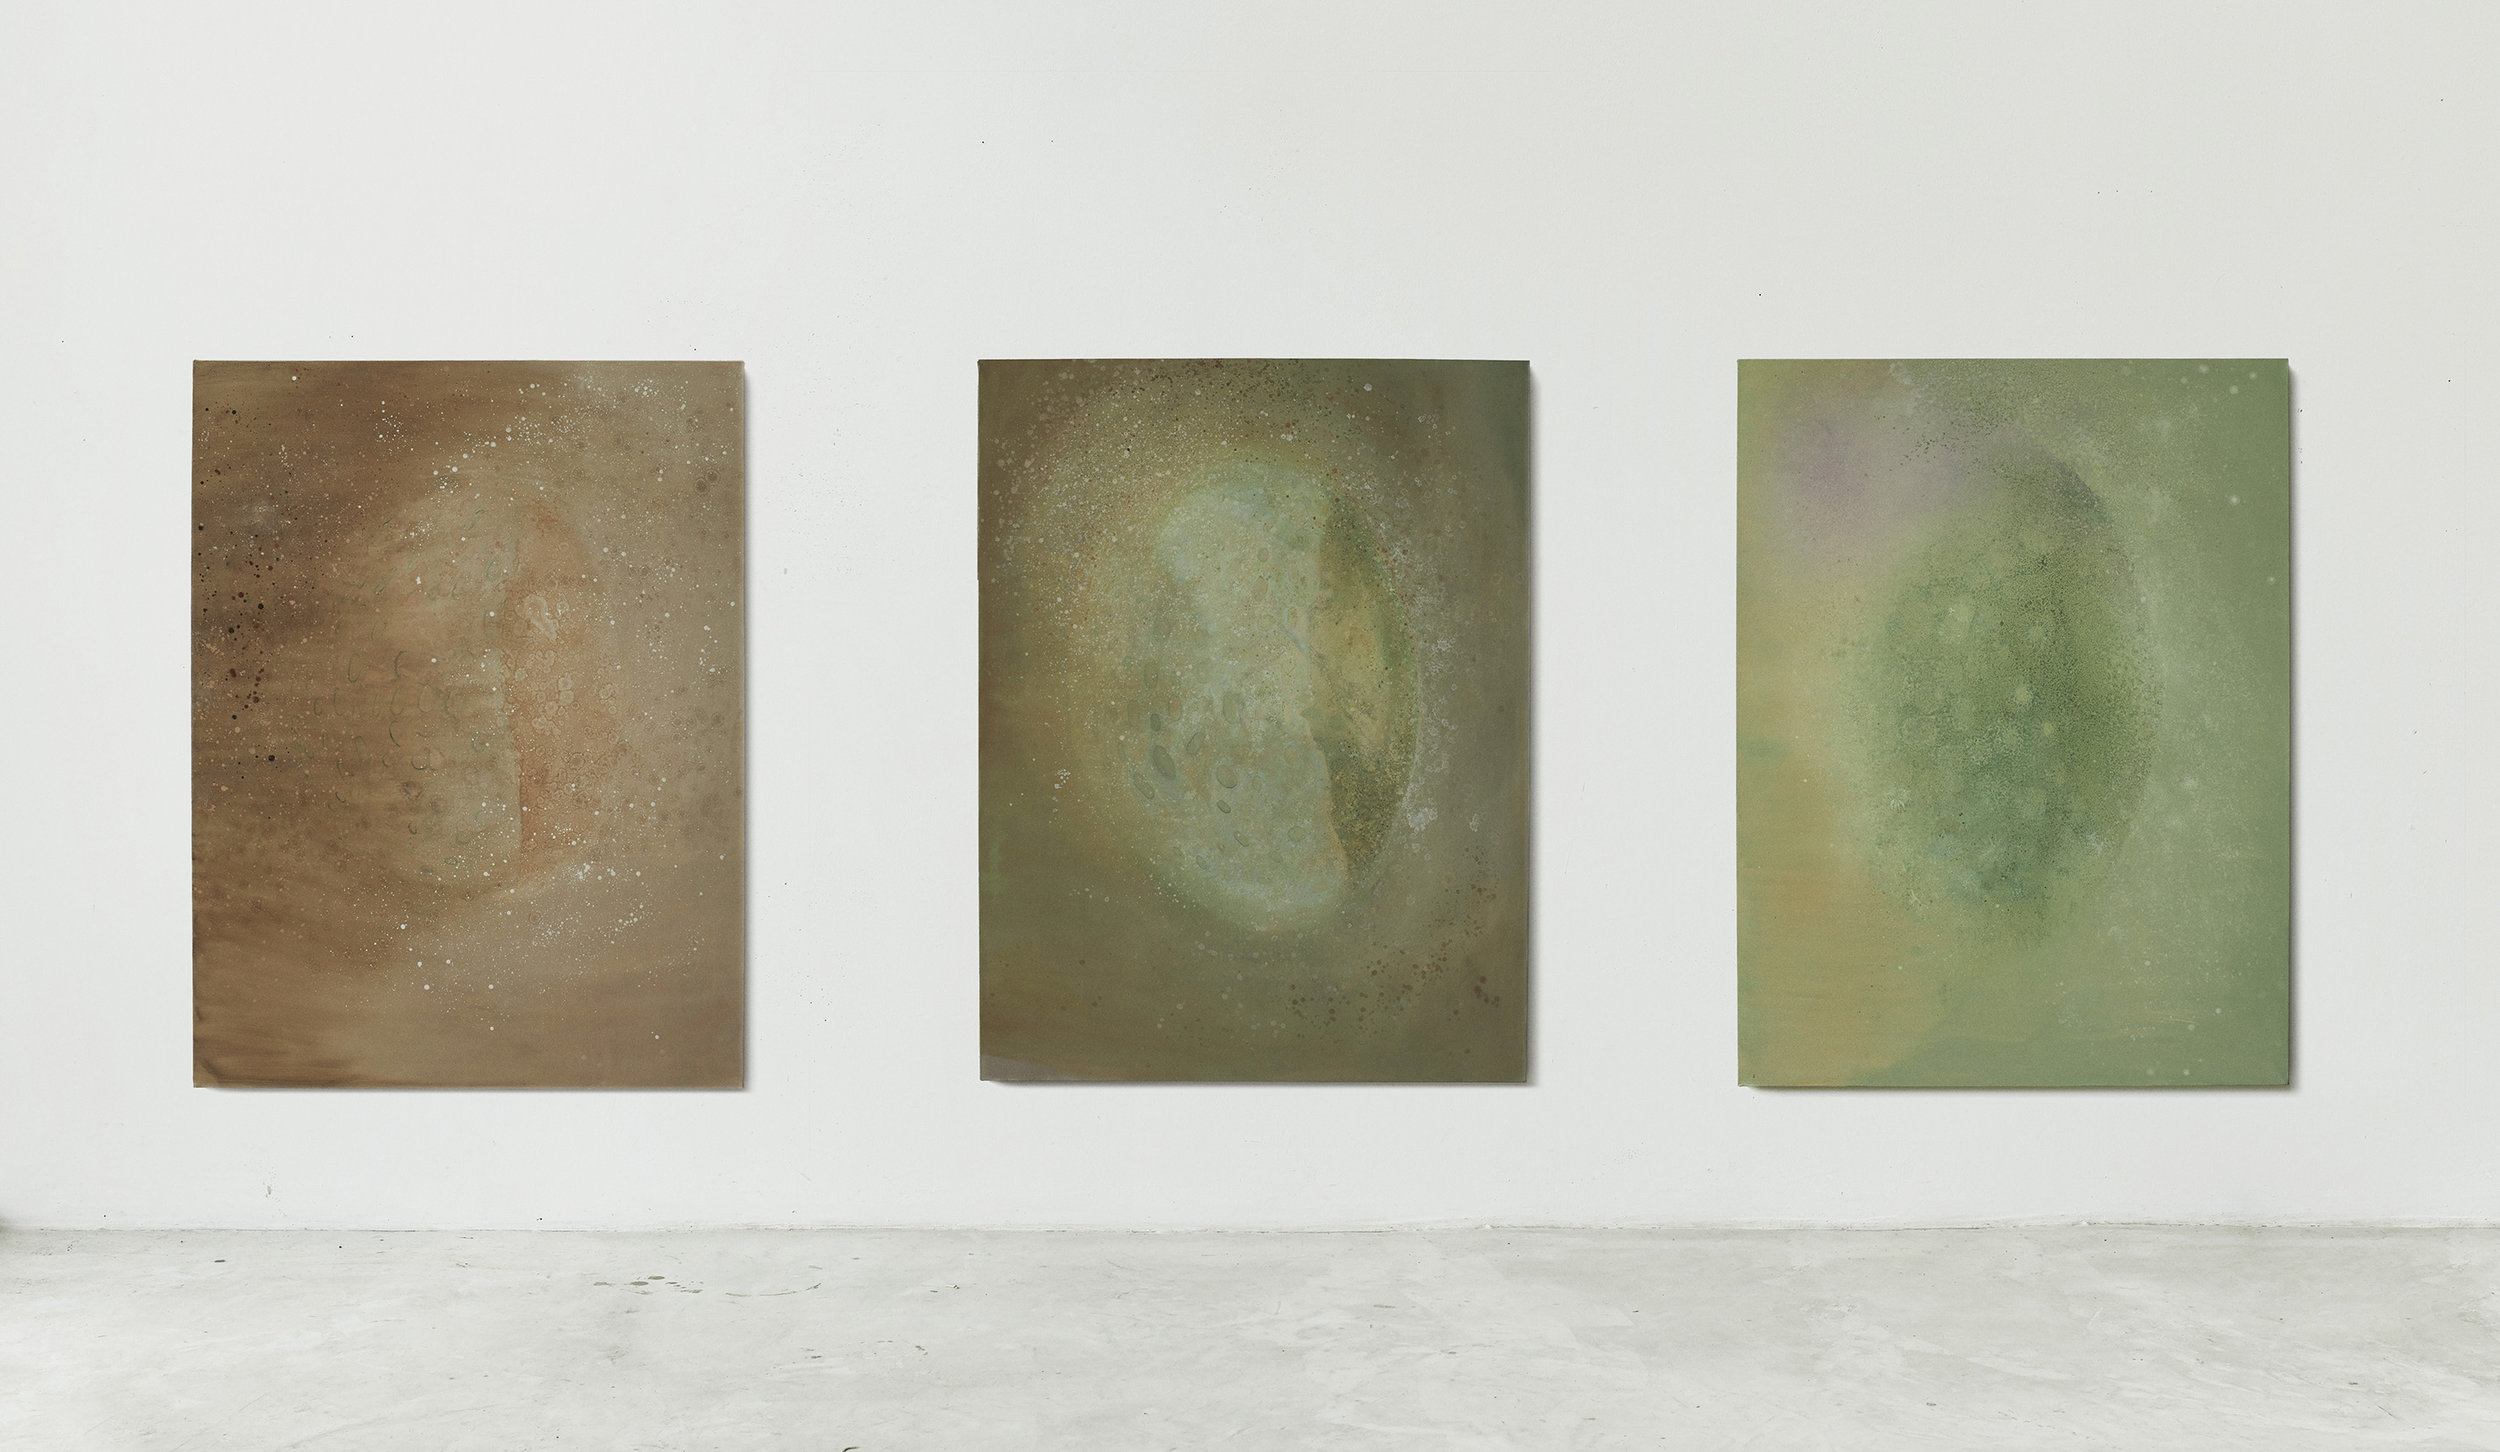 Nebula, Installation View, my studio, 2019